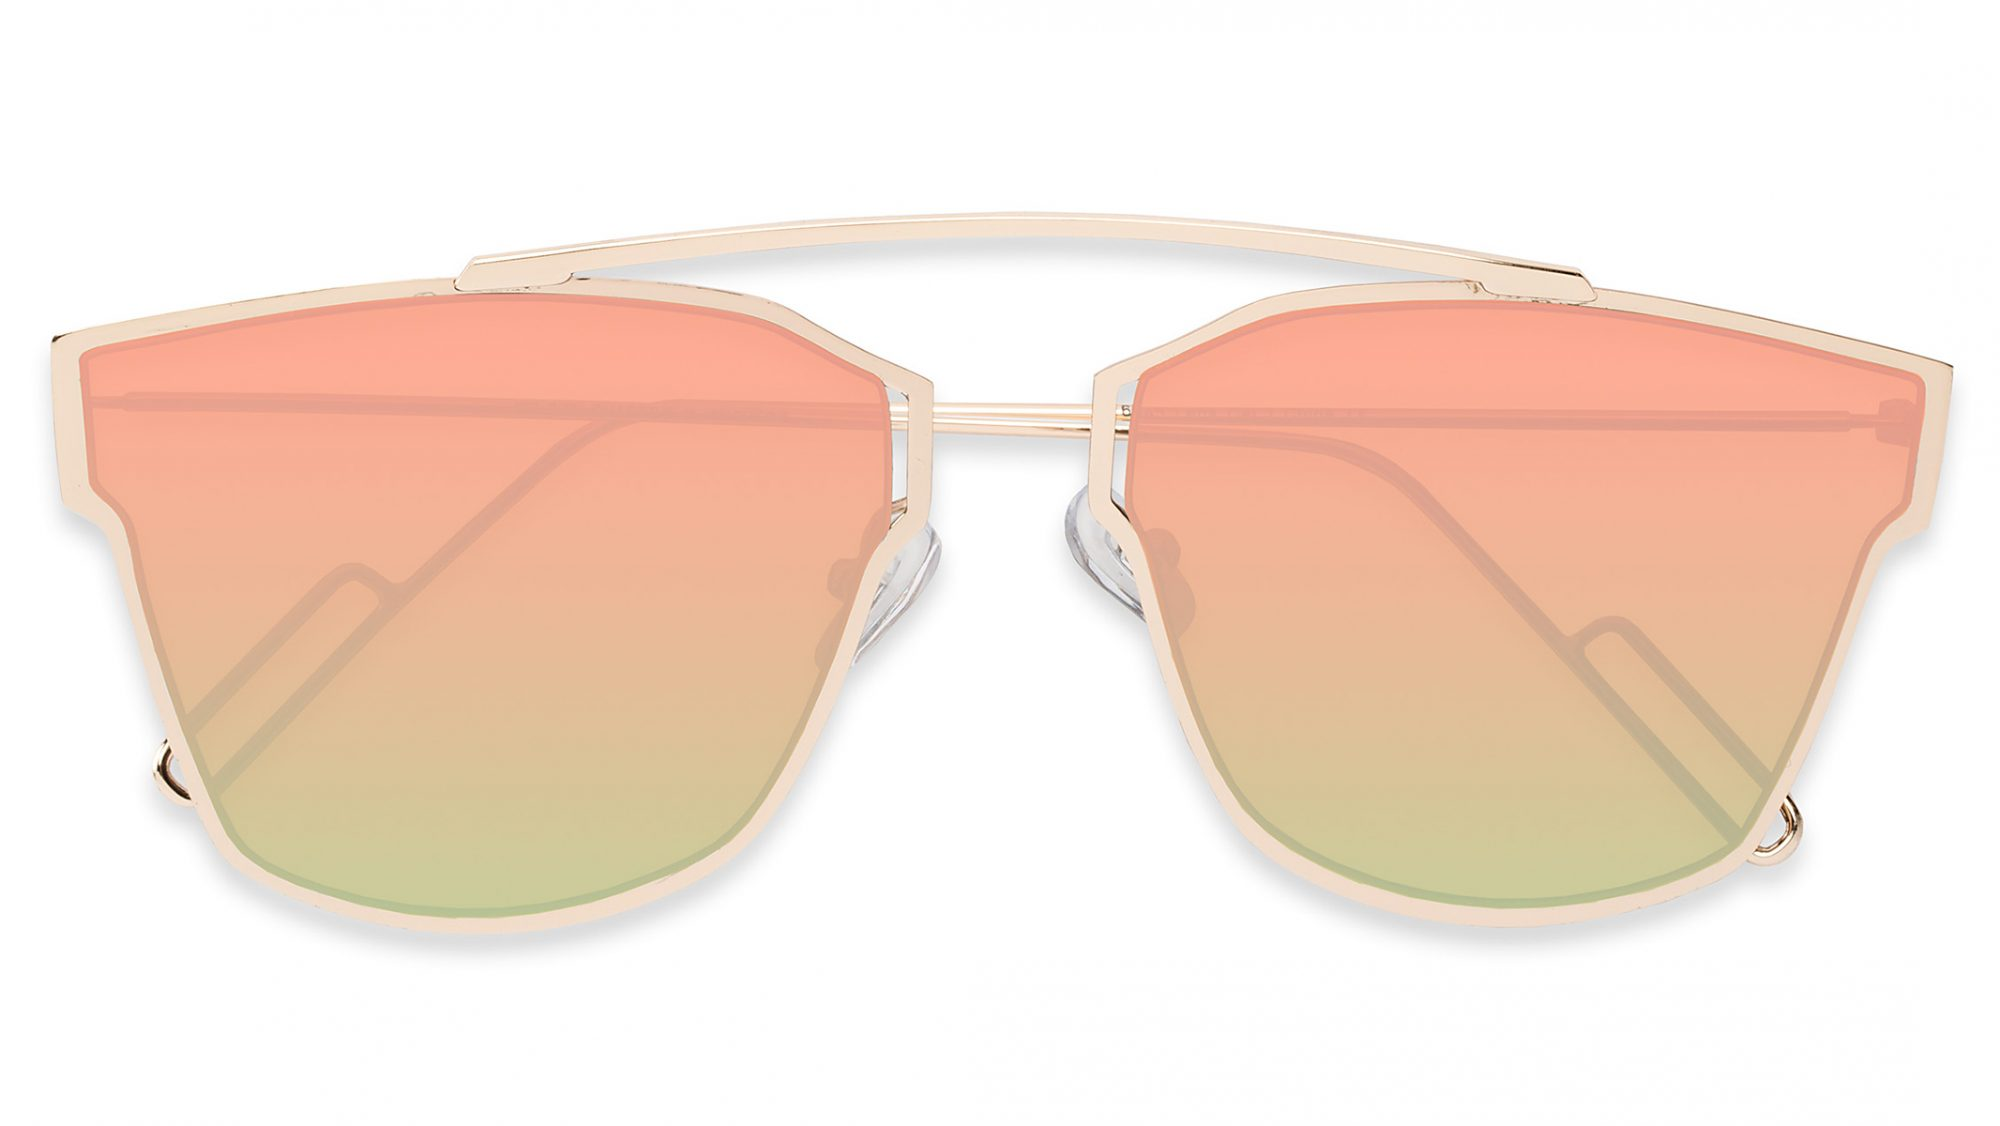 Sunglass Warehouse Octavia sunglasses